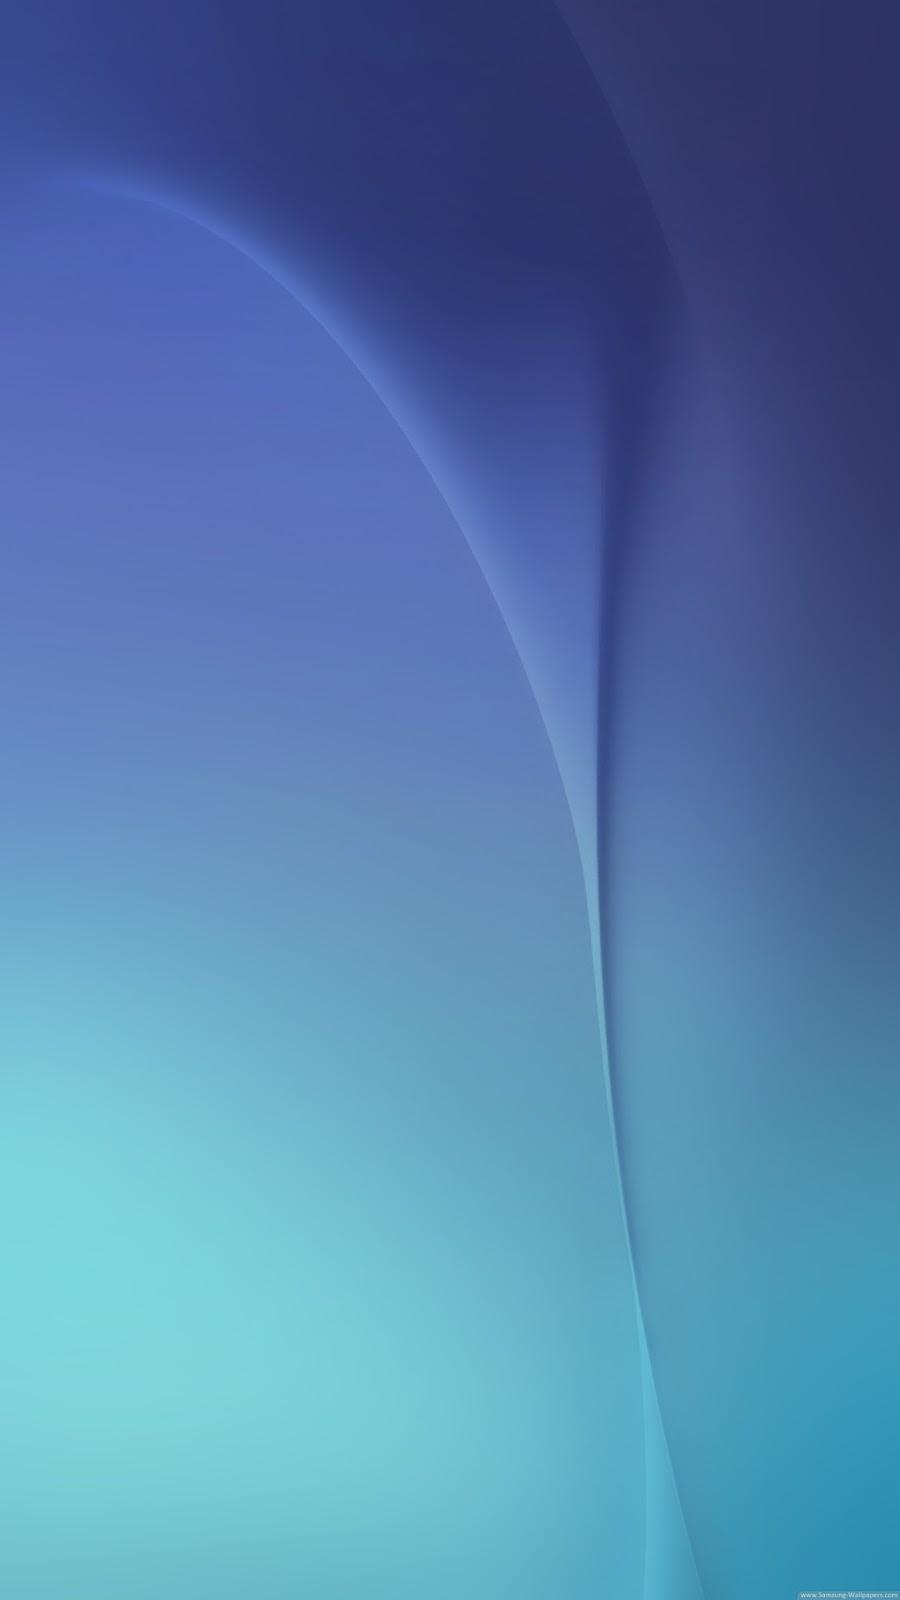 samsung galaxy s6 & s6 edge hd wallpapers - dezignhd - best source